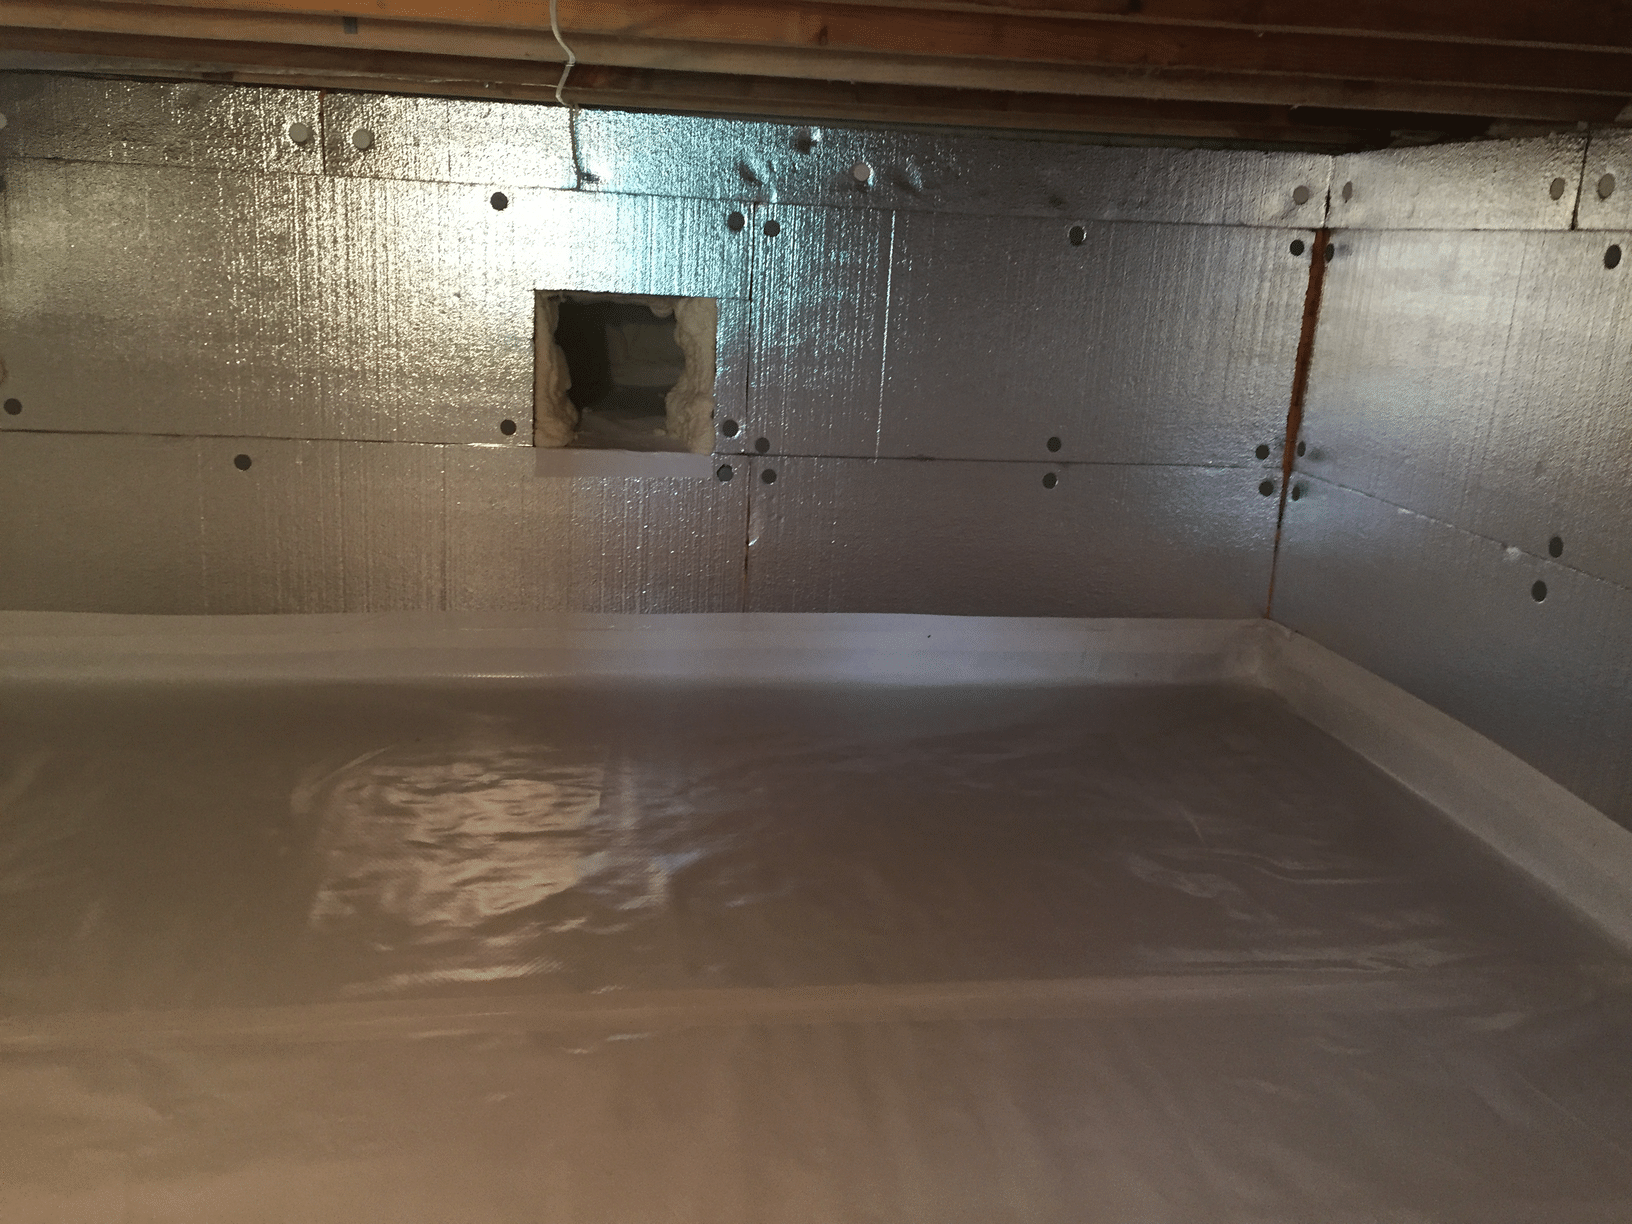 Crawlspace Encapsulation in Seymour, CT